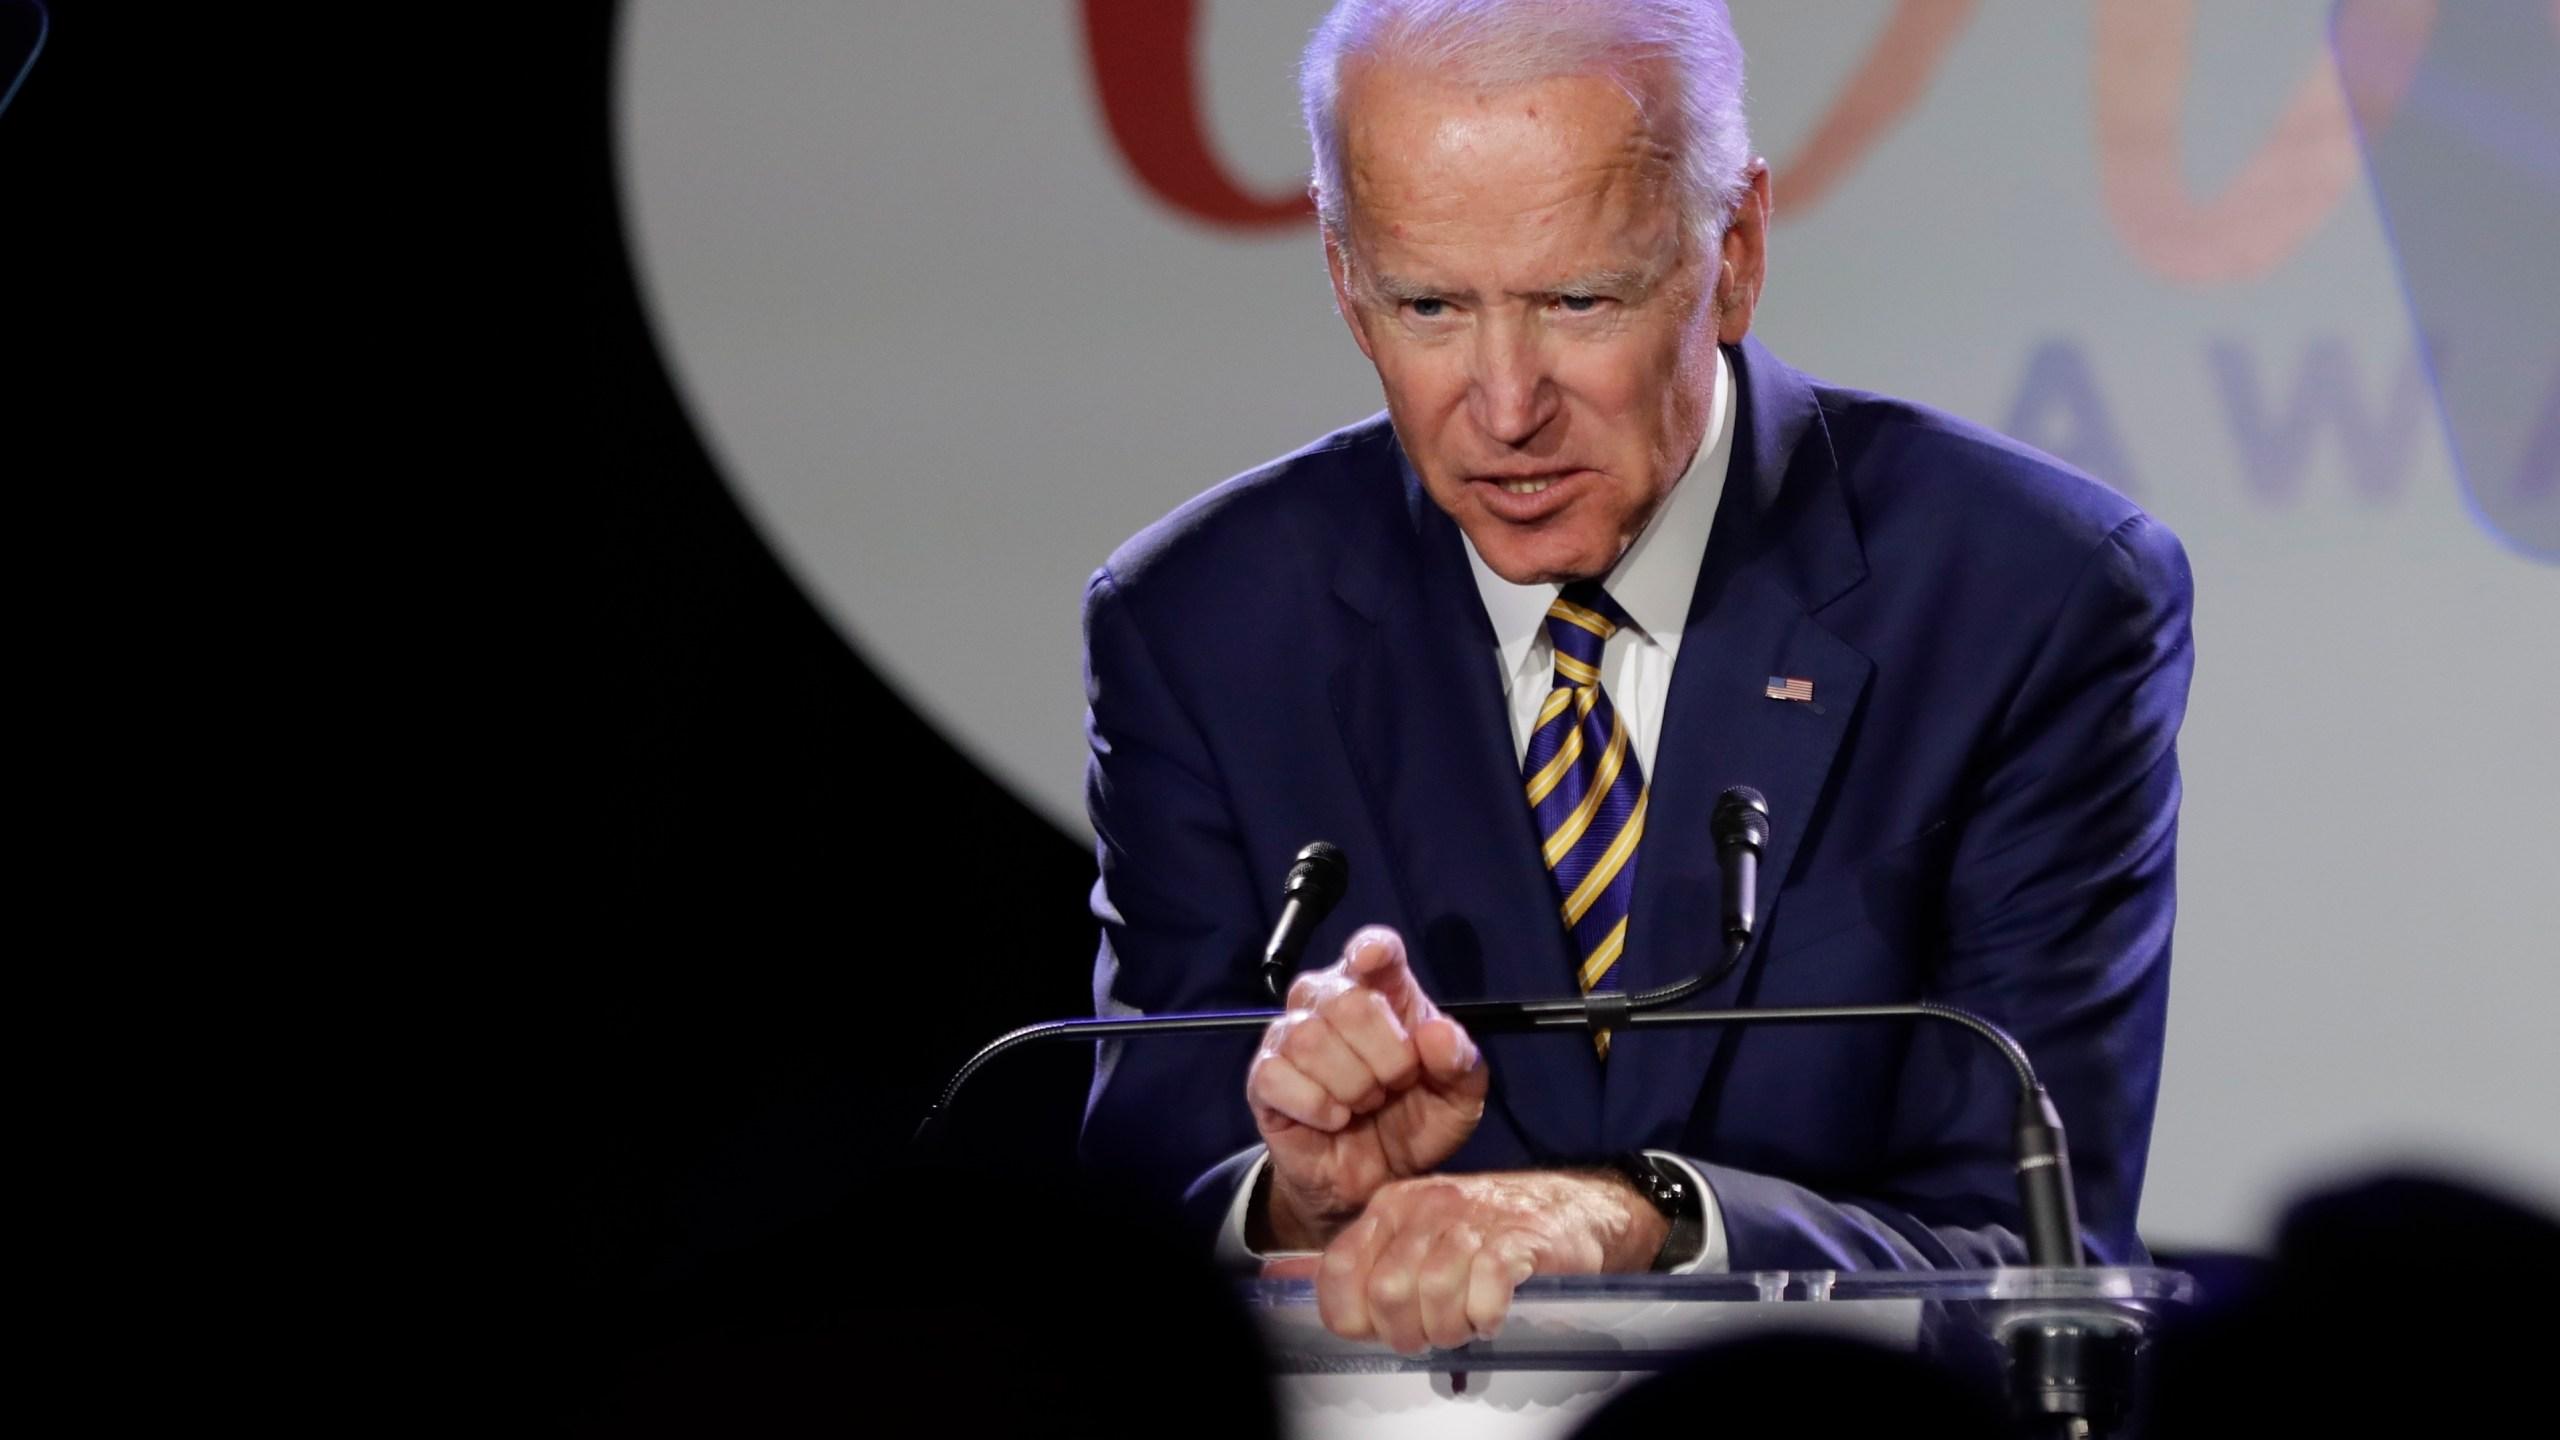 Election_2020_Joe_Biden_53157-159532.jpg31942436